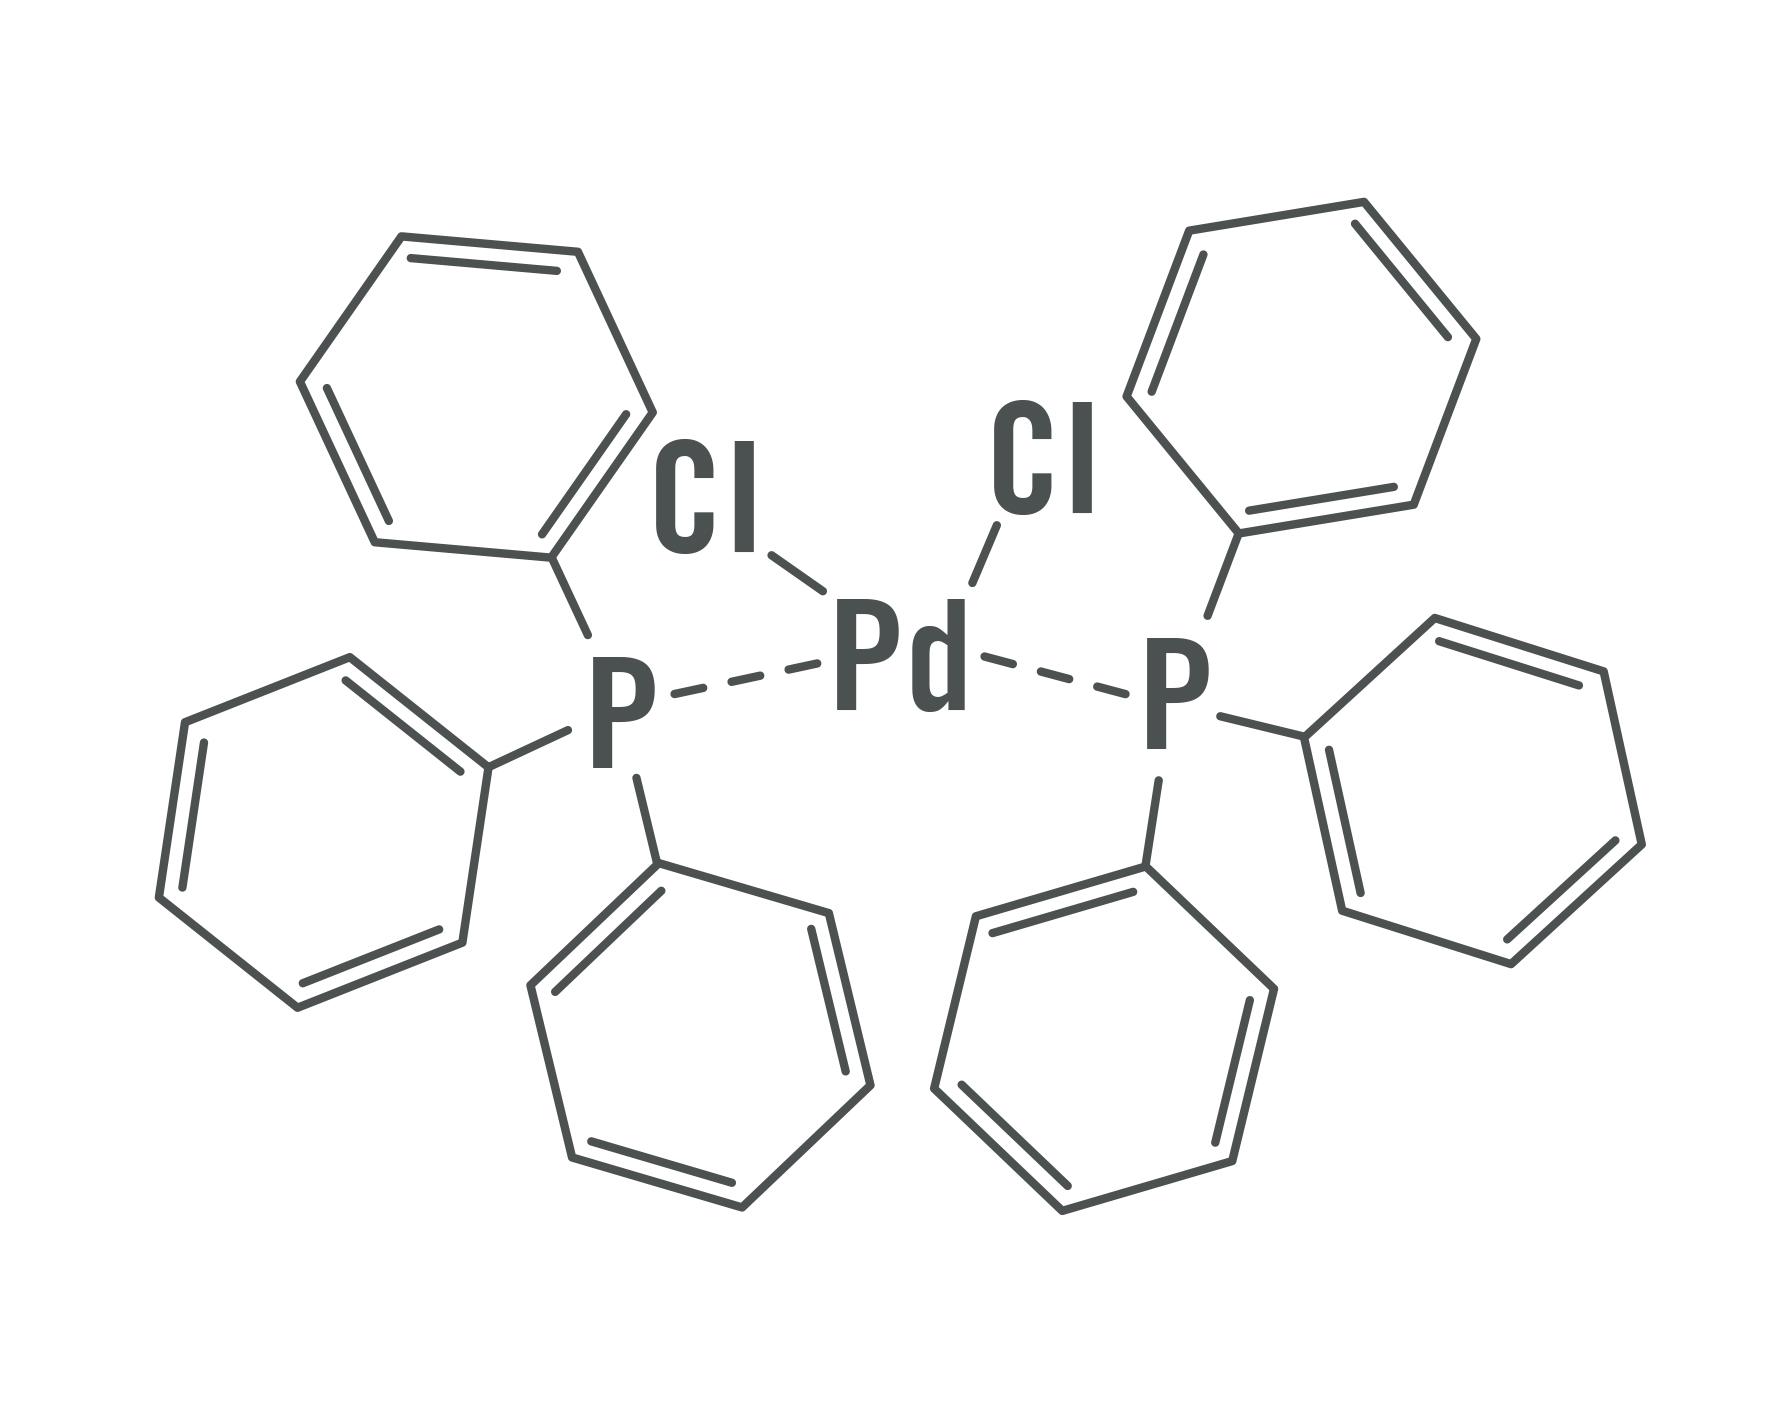 Dichlorobis(triphenylphosphane)palladium(II)